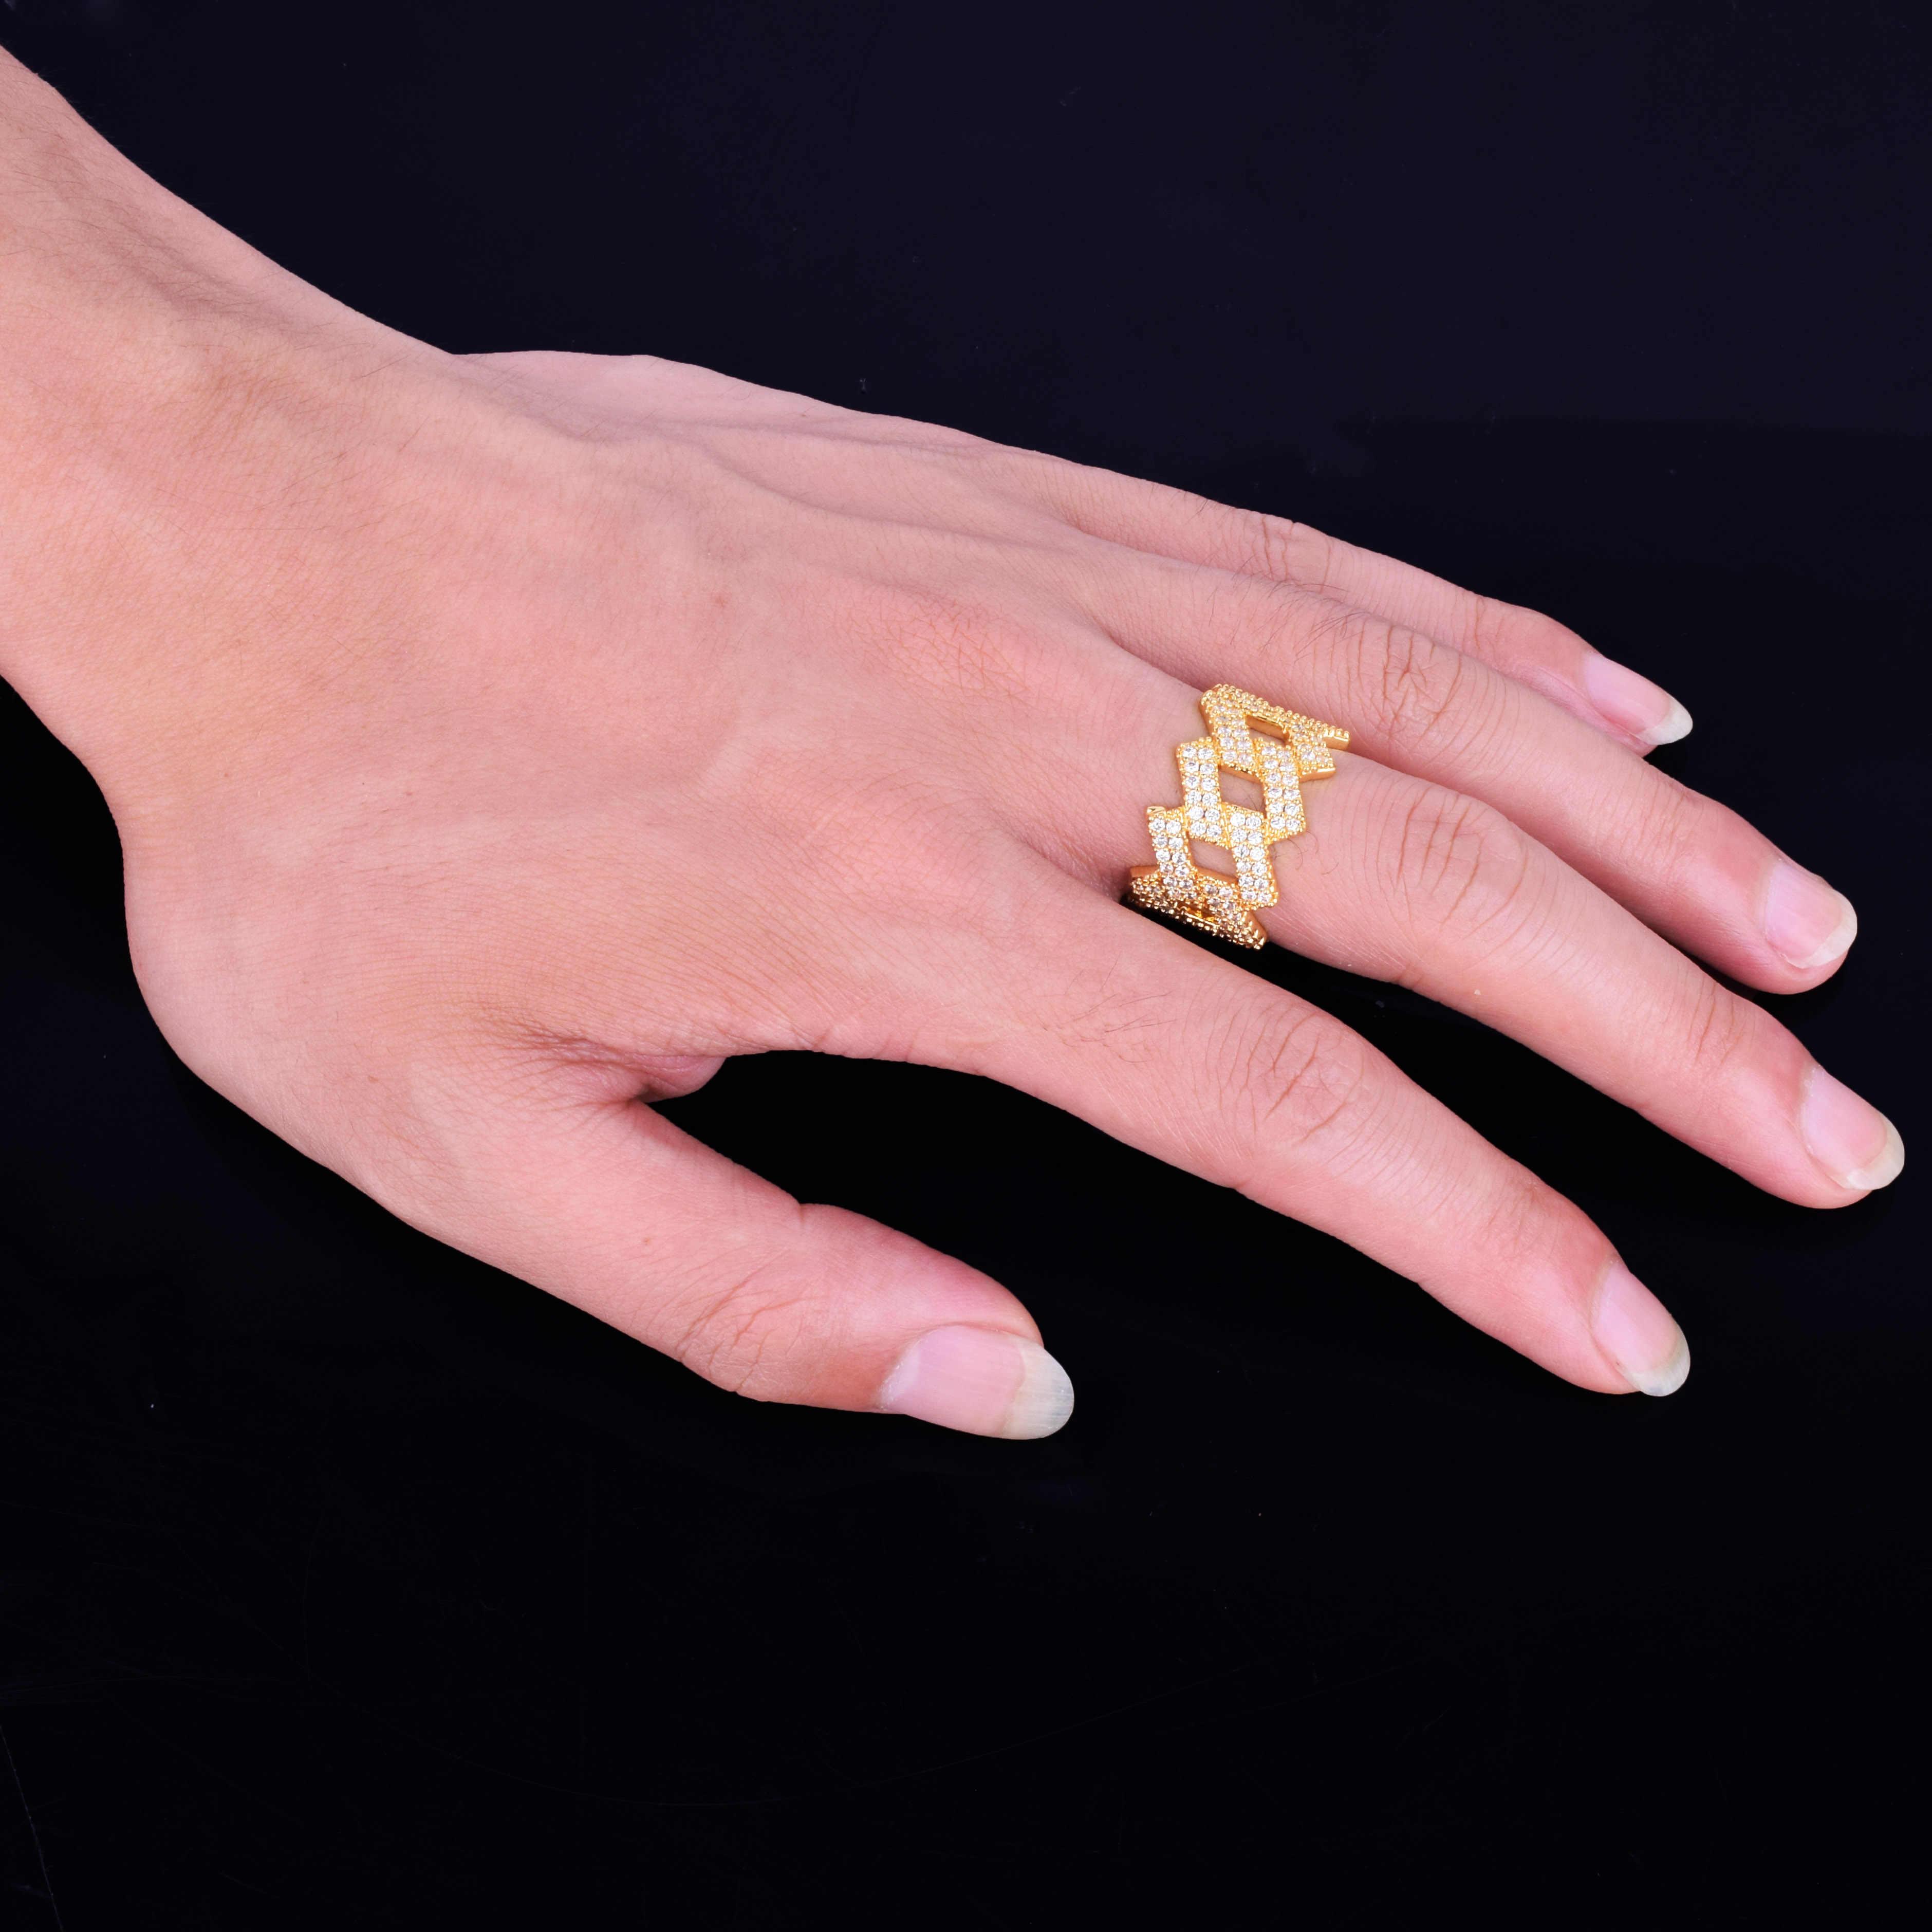 Miami Cuban Chain แหวนผู้ชาย Gold Silver Iced Out Zircon Hip Hop แหวน Rock เครื่องประดับ